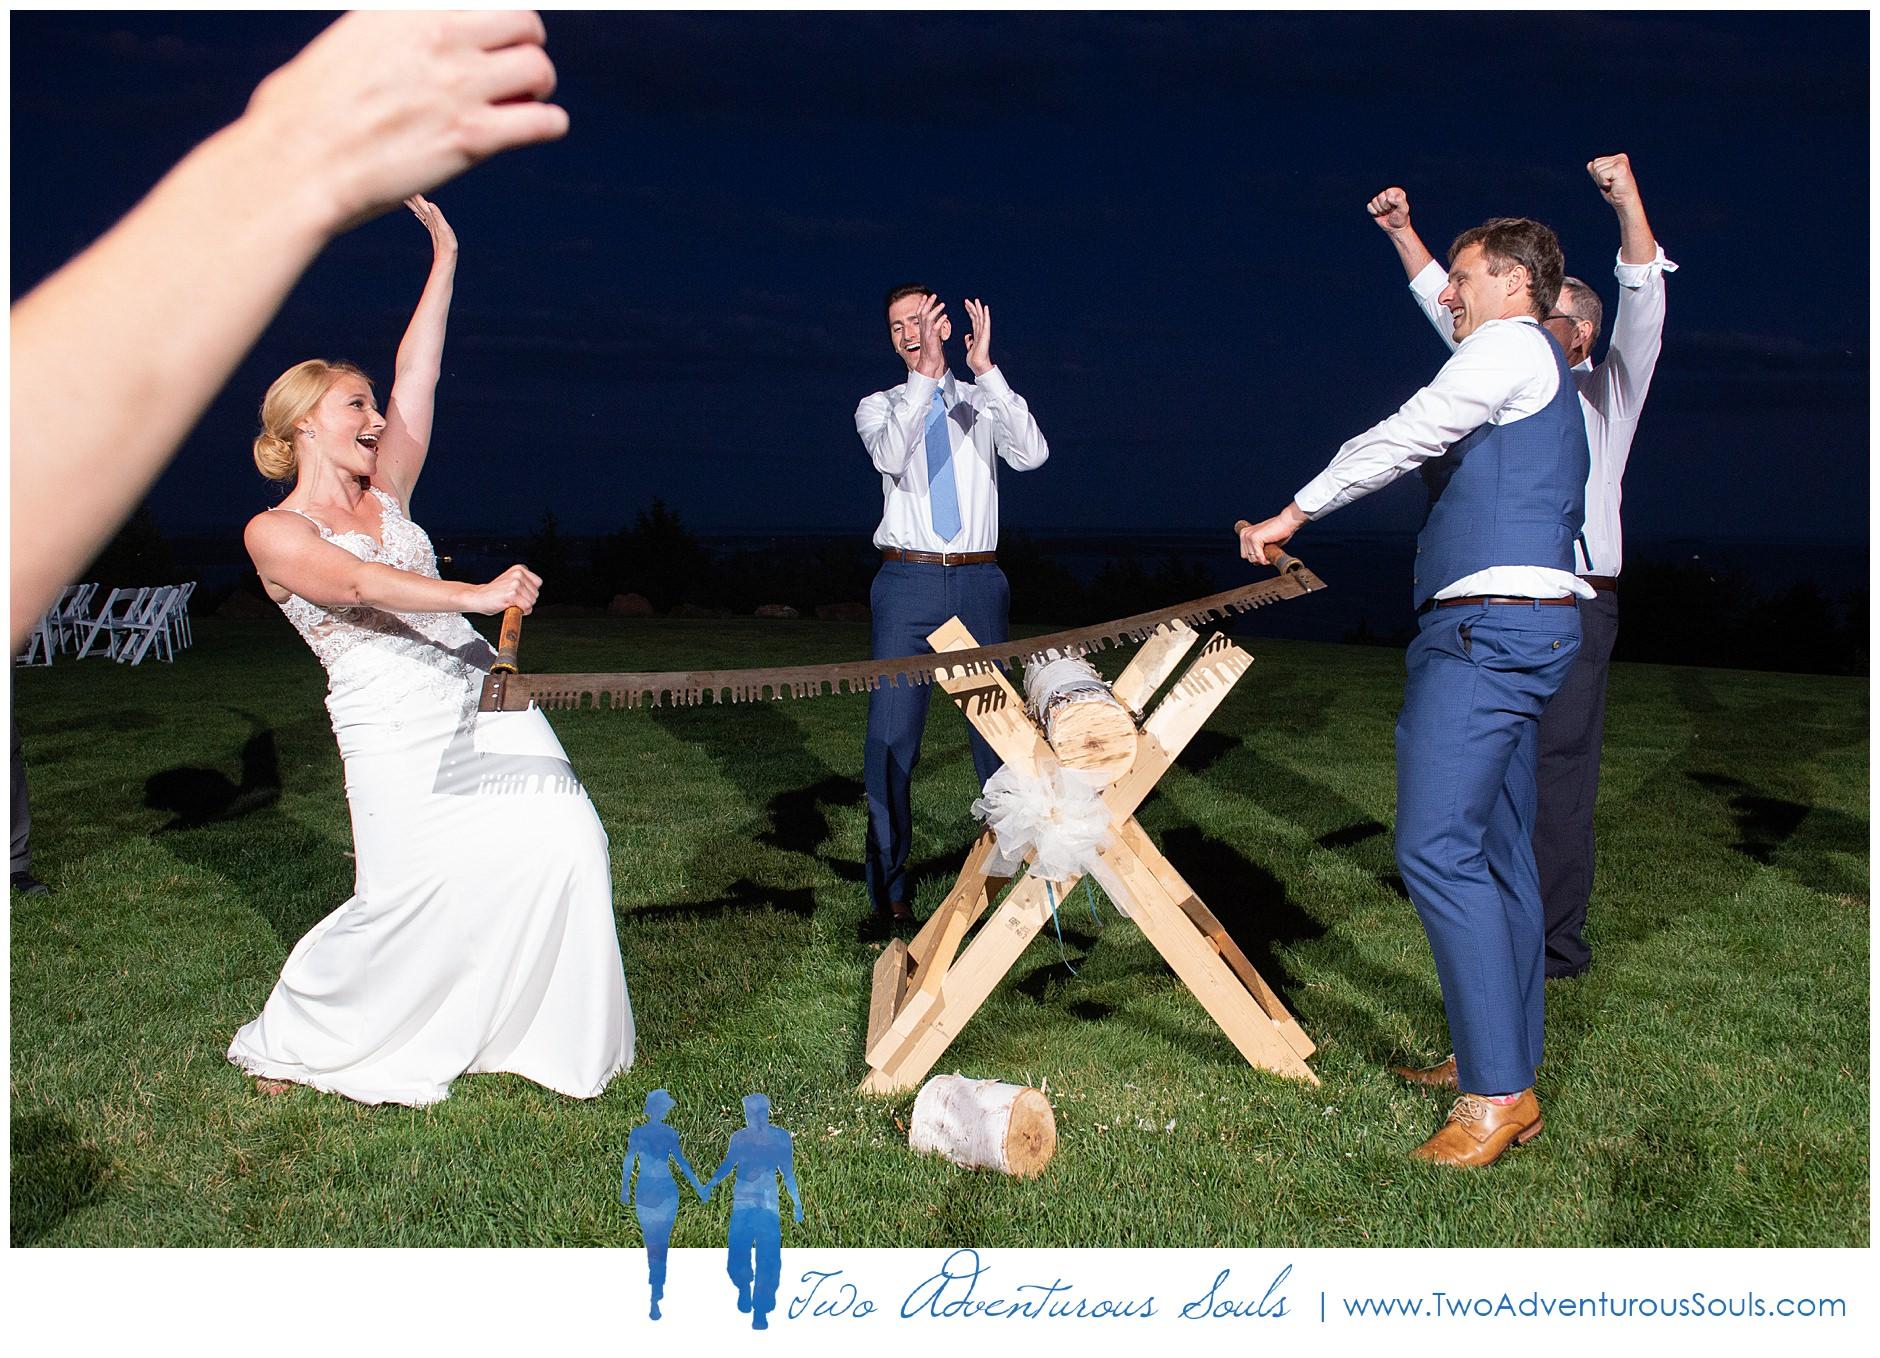 Maine Wedding Photographers, Point Lookout Wedding Photographers, Maine Elopement Photographers, Two Adventurous Souls-0080419_0067.jpg